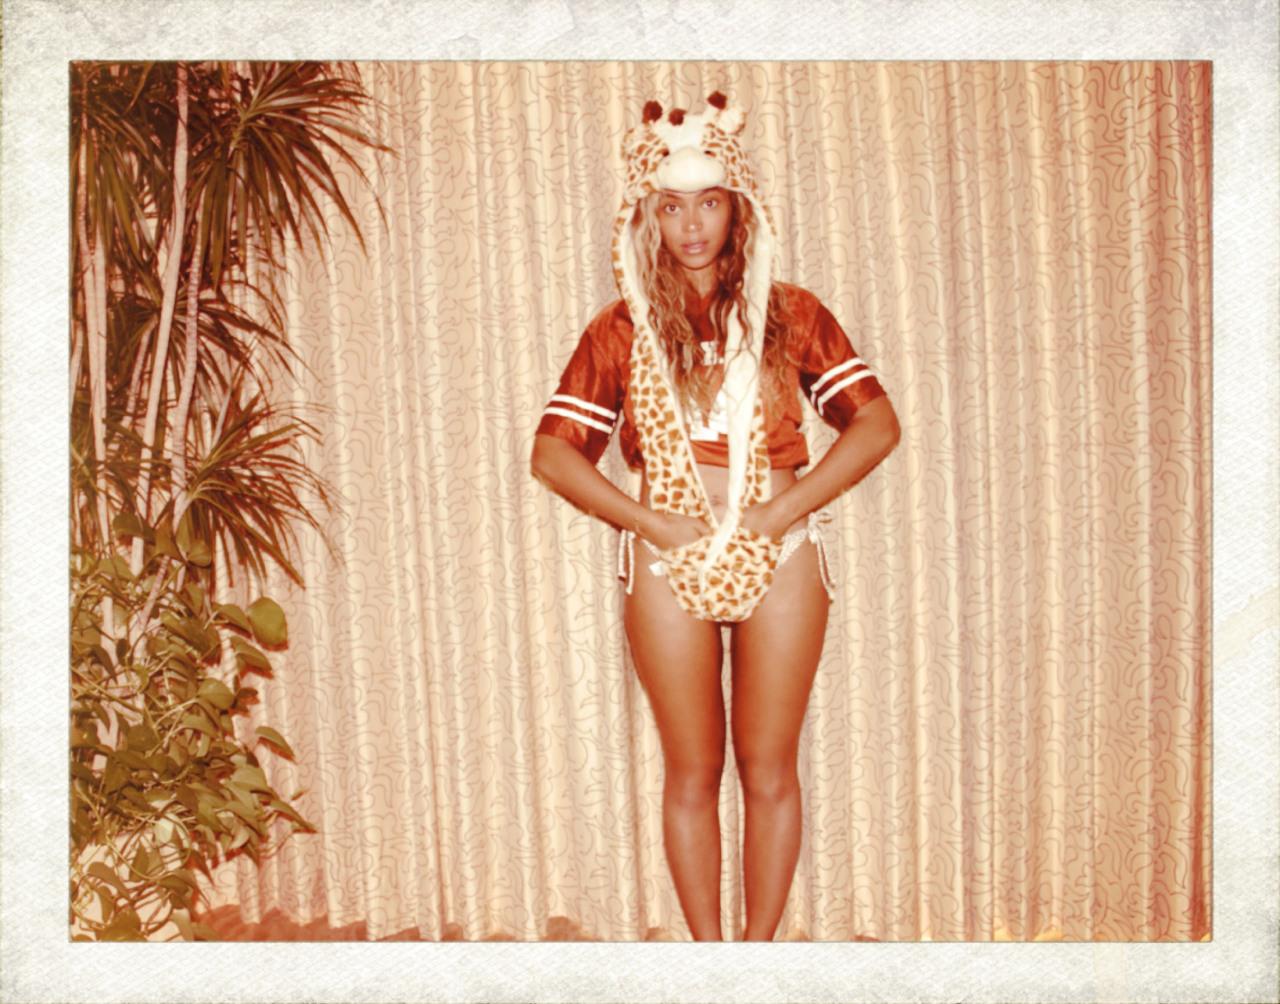 Beyoncé - Twitter (@Beyonce), Instagram (Baddiebey), Tumblr (I Am...) - Página 49 Tumblr_mxlqnij6Y61rqgjz2o1_1280